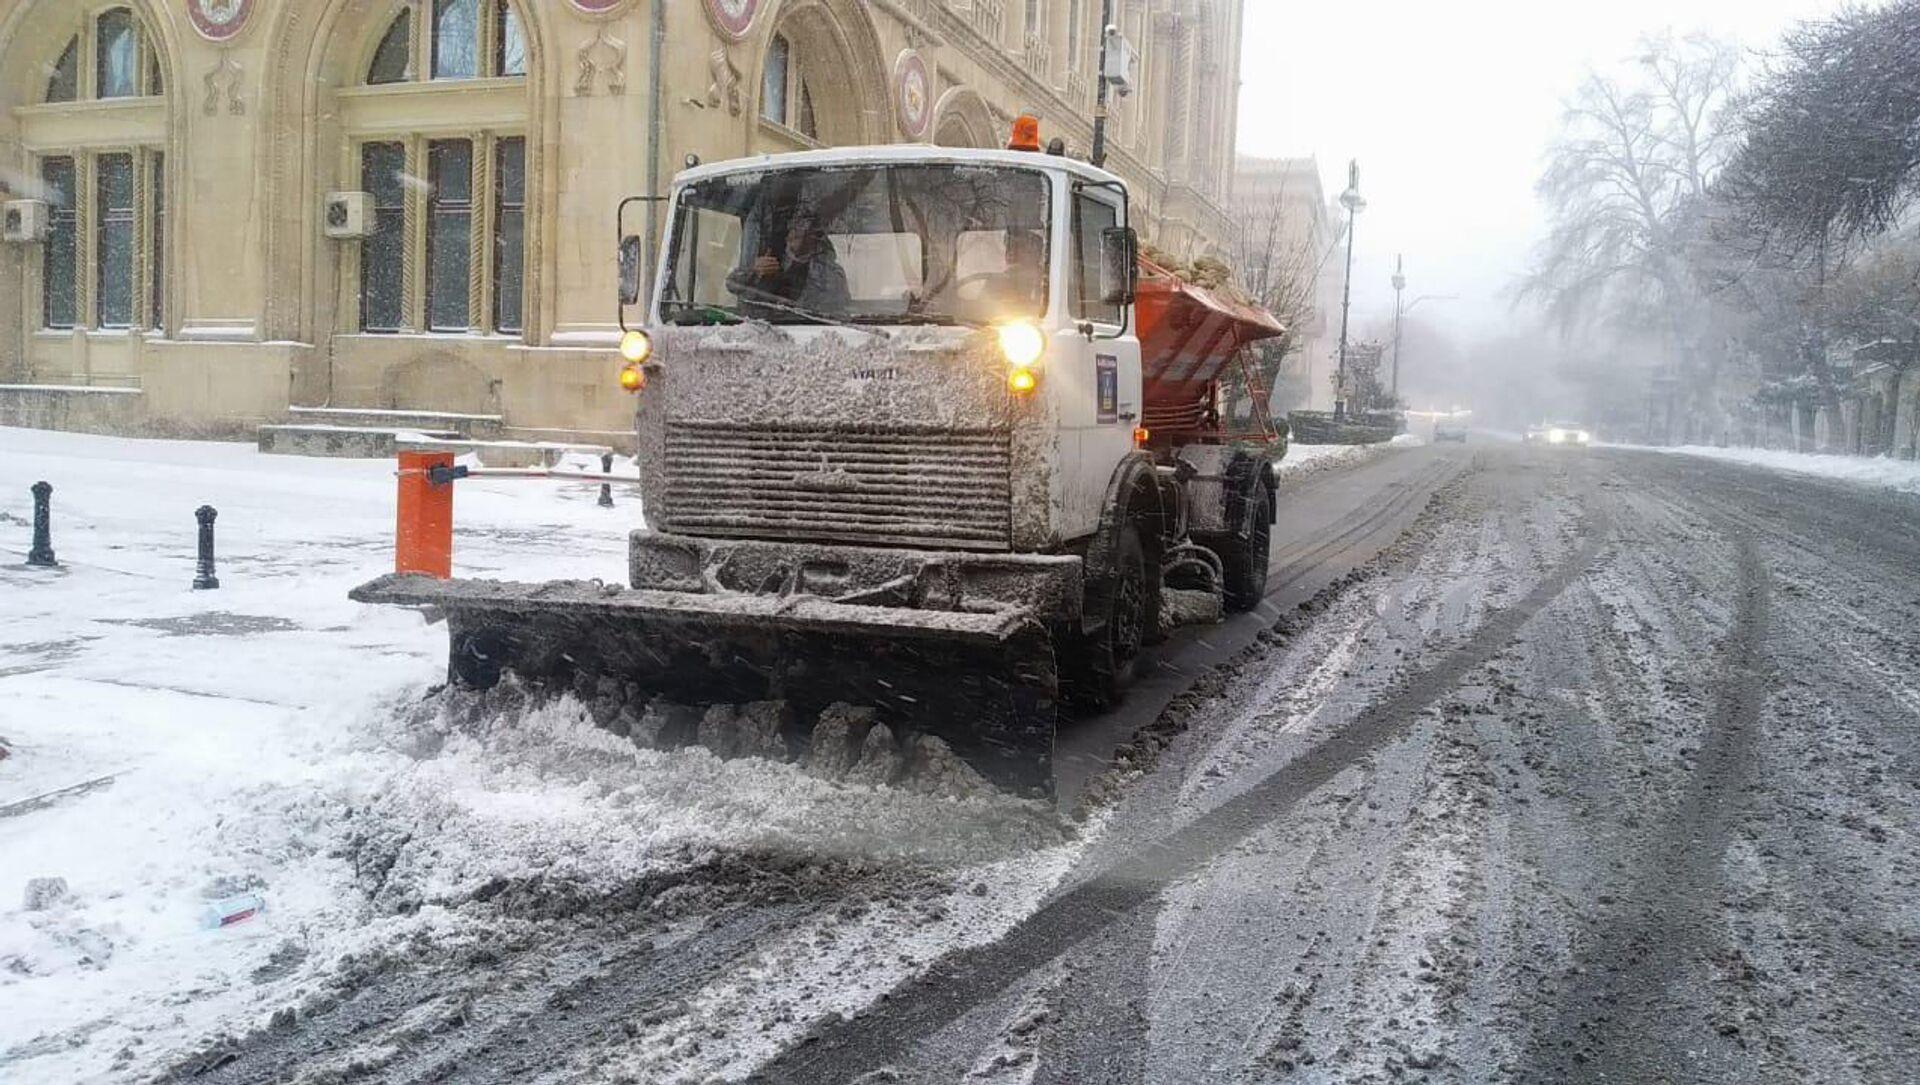 Снегоуборочная техника в Баку, 24 февраля 2021 года - Sputnik Азербайджан, 1920, 24.02.2021